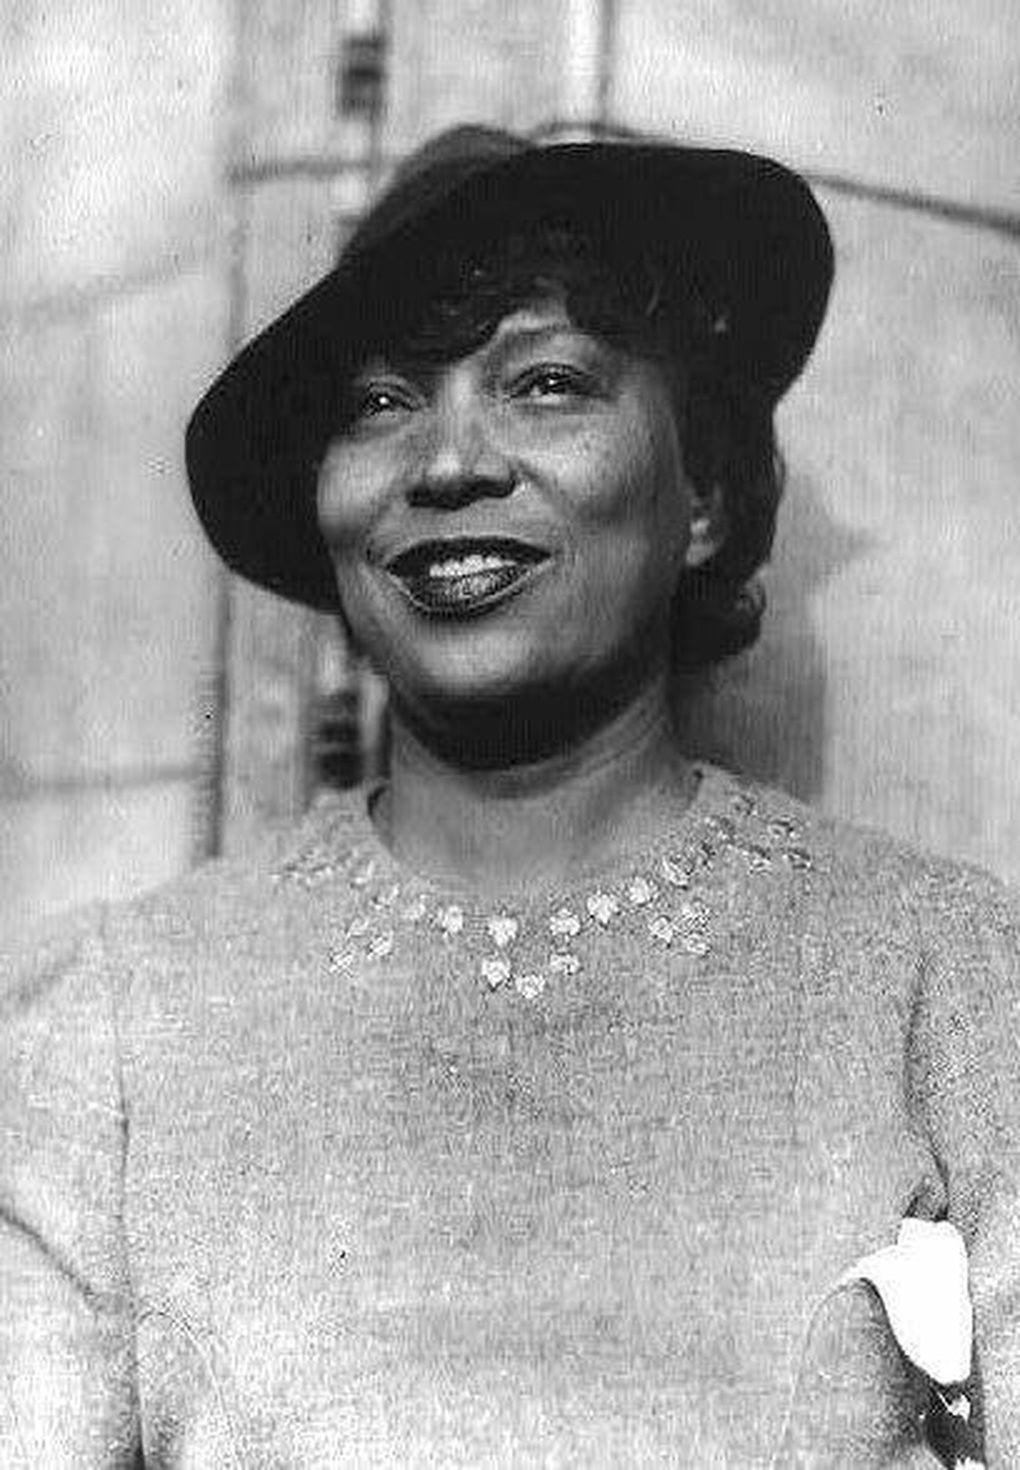 Iconic Black writer Zora Neale Hurston smiles in this undated photo. (Tribune News Service)